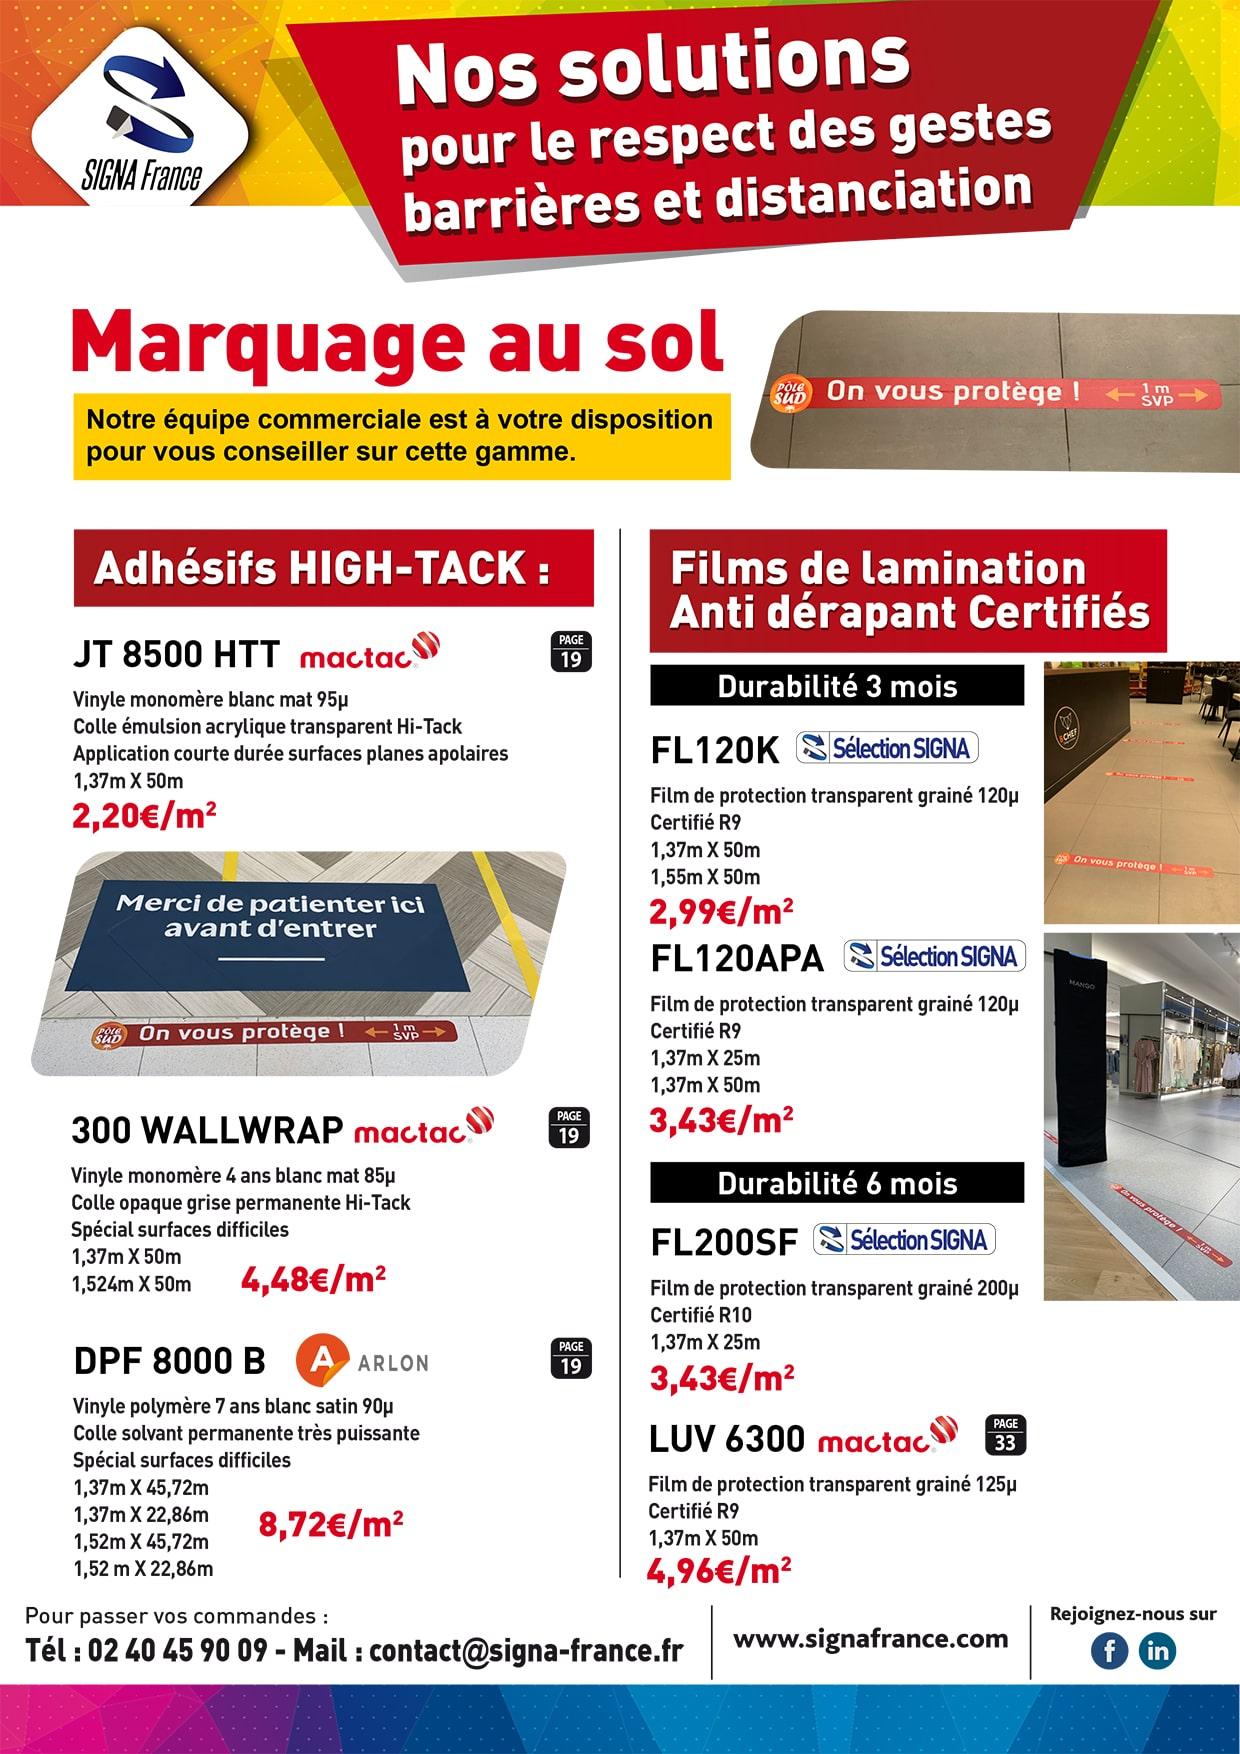 Promotion Covid Marquage au sol - Signa France